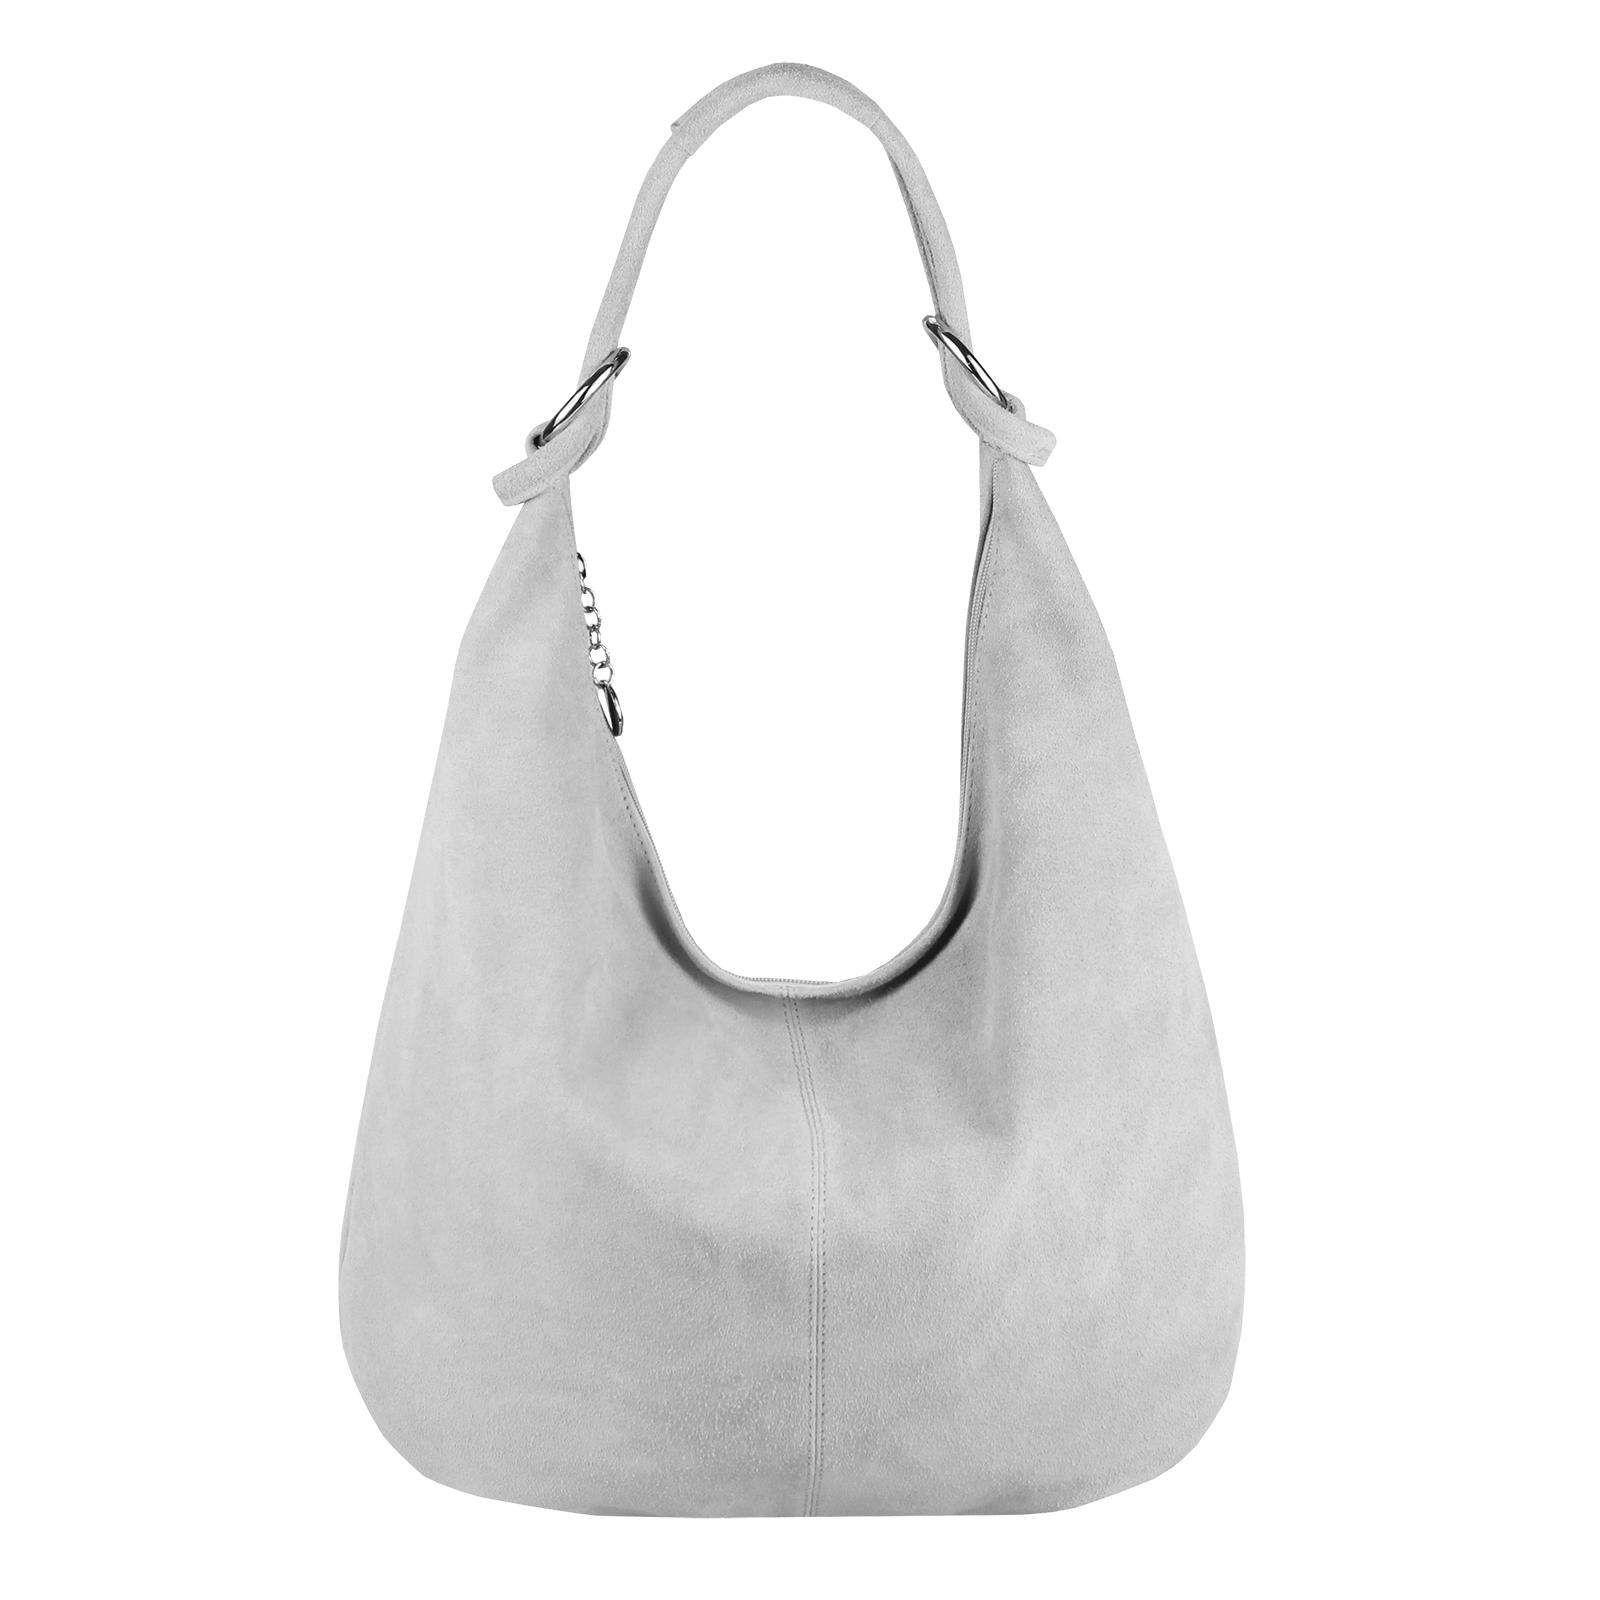 fc9742bf4d3a7 Made in Italy Damen XXL Ledertasche Wildleder Shopper Tasche Schultertasche  Umhängetasche Hobo-Bag Beuteltasche Hellgrau